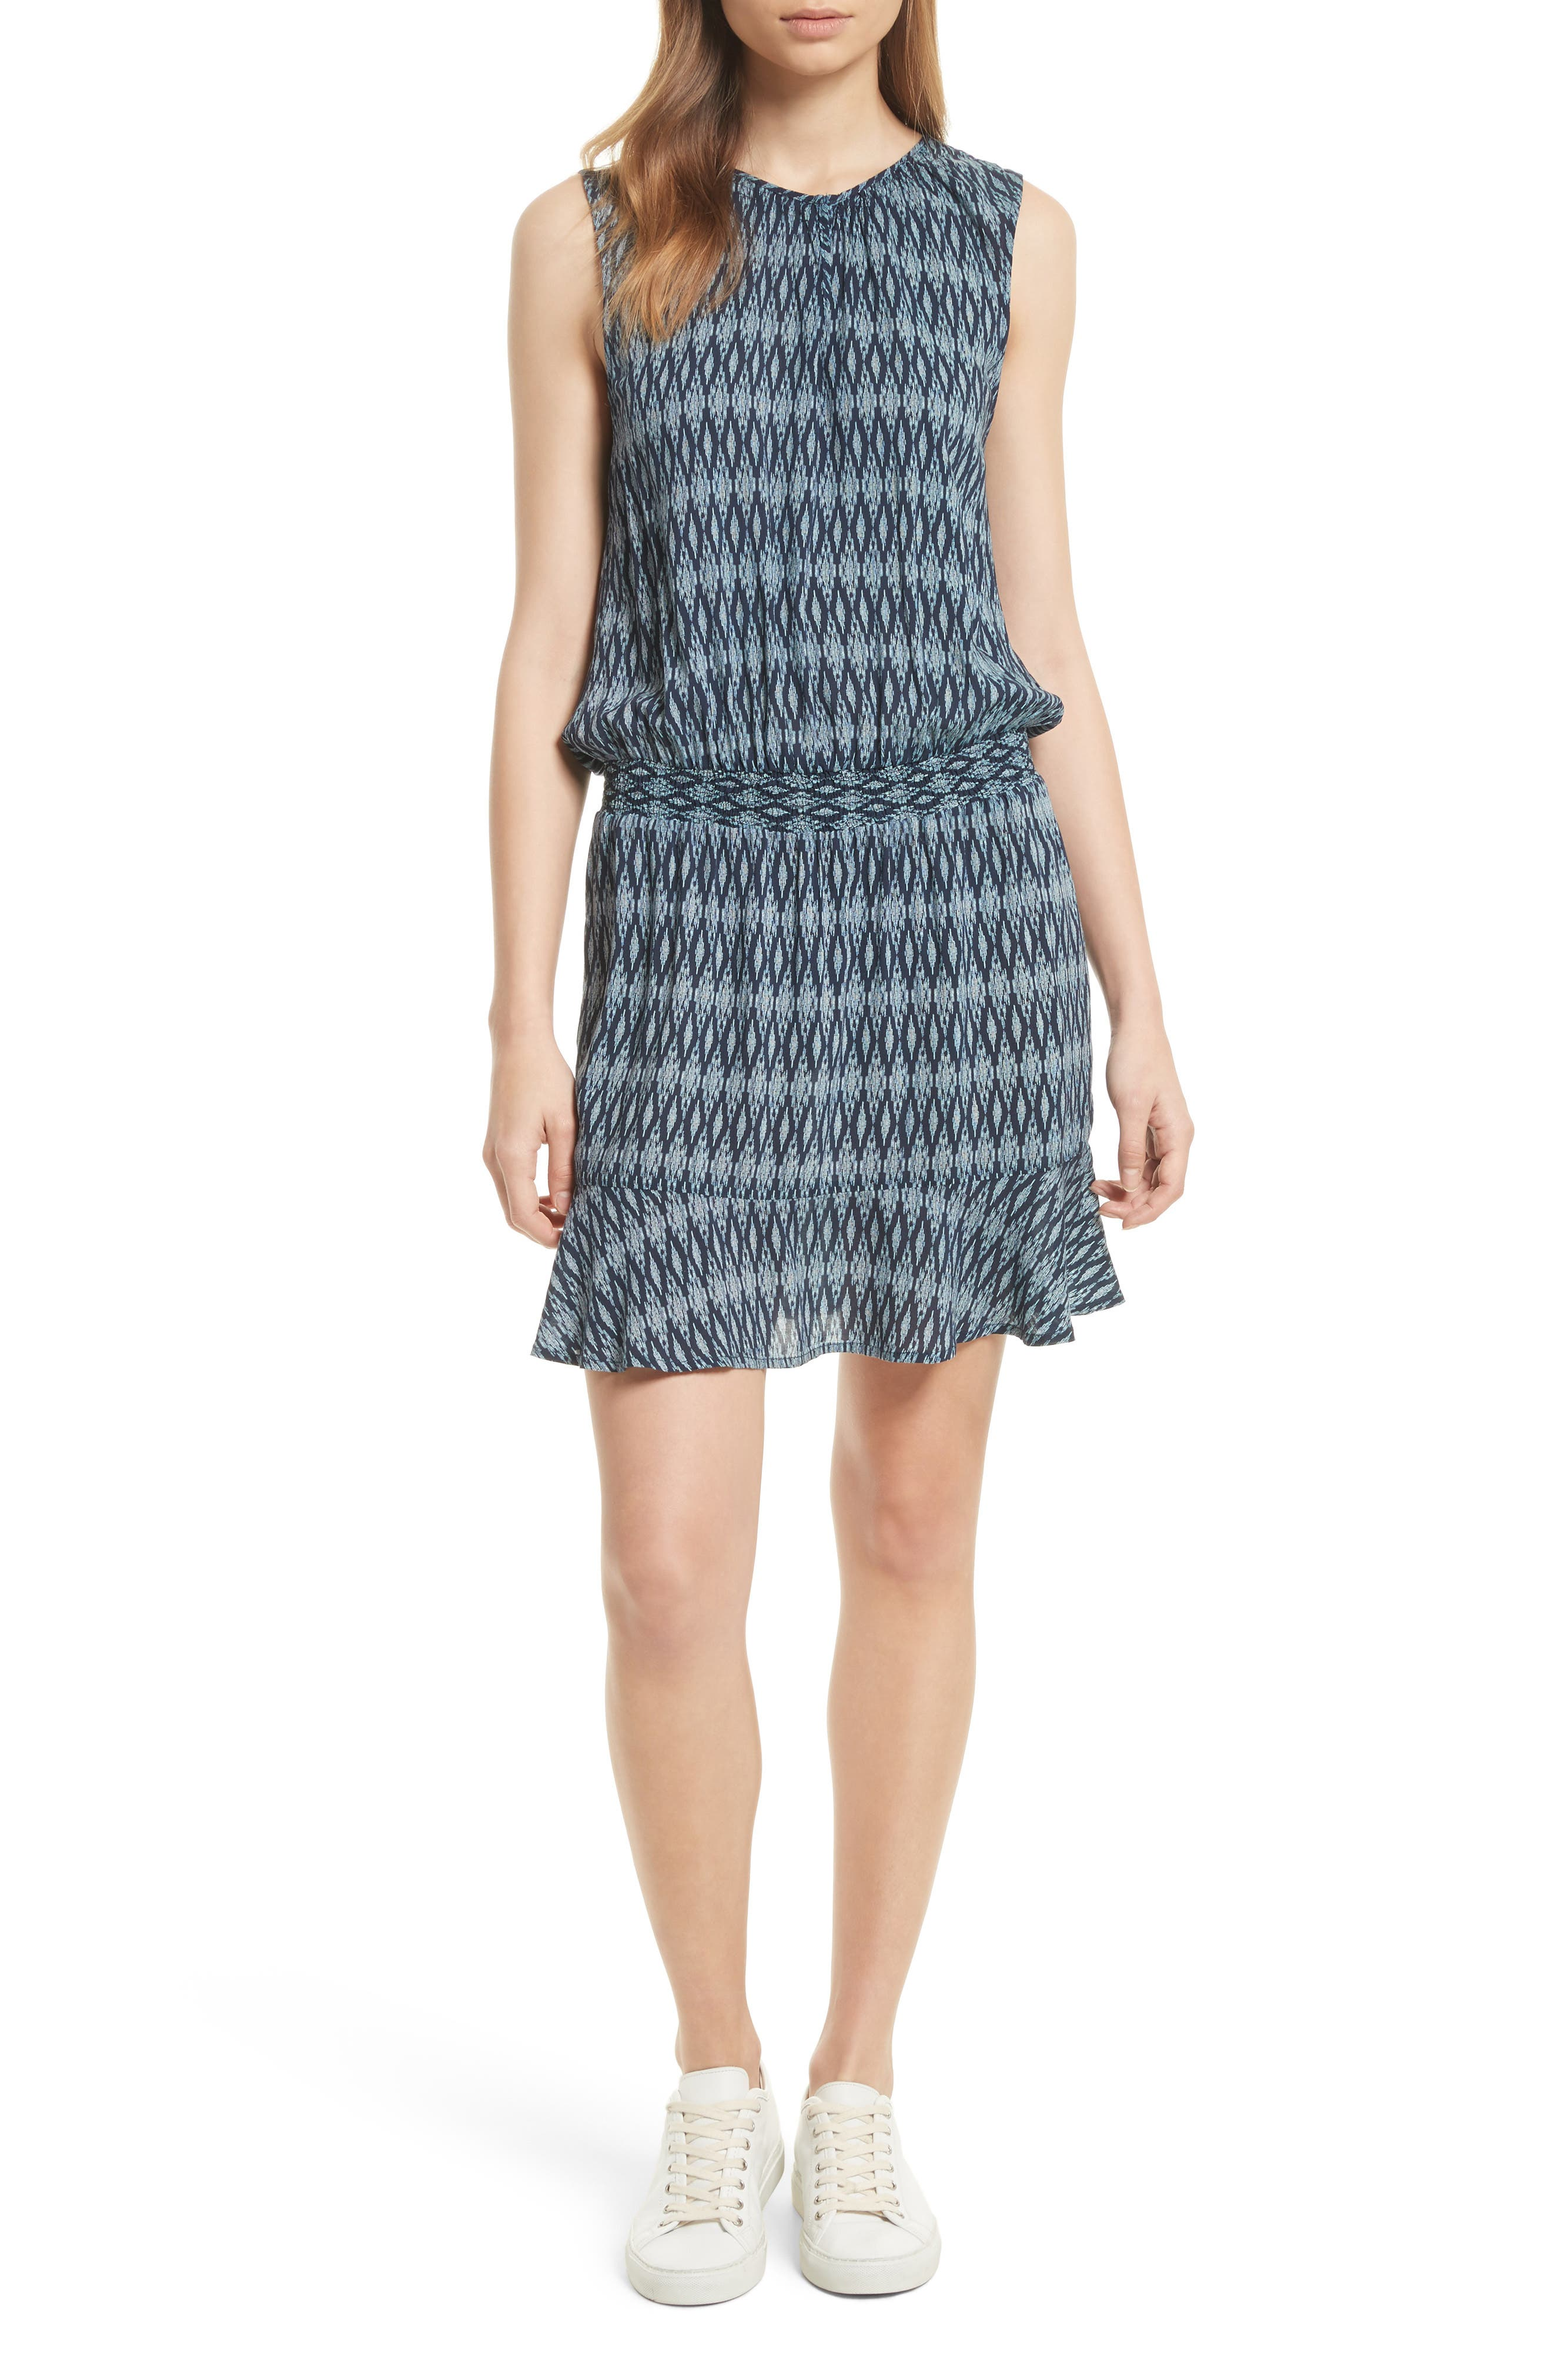 Soft Joie Zealana Blouson Dress